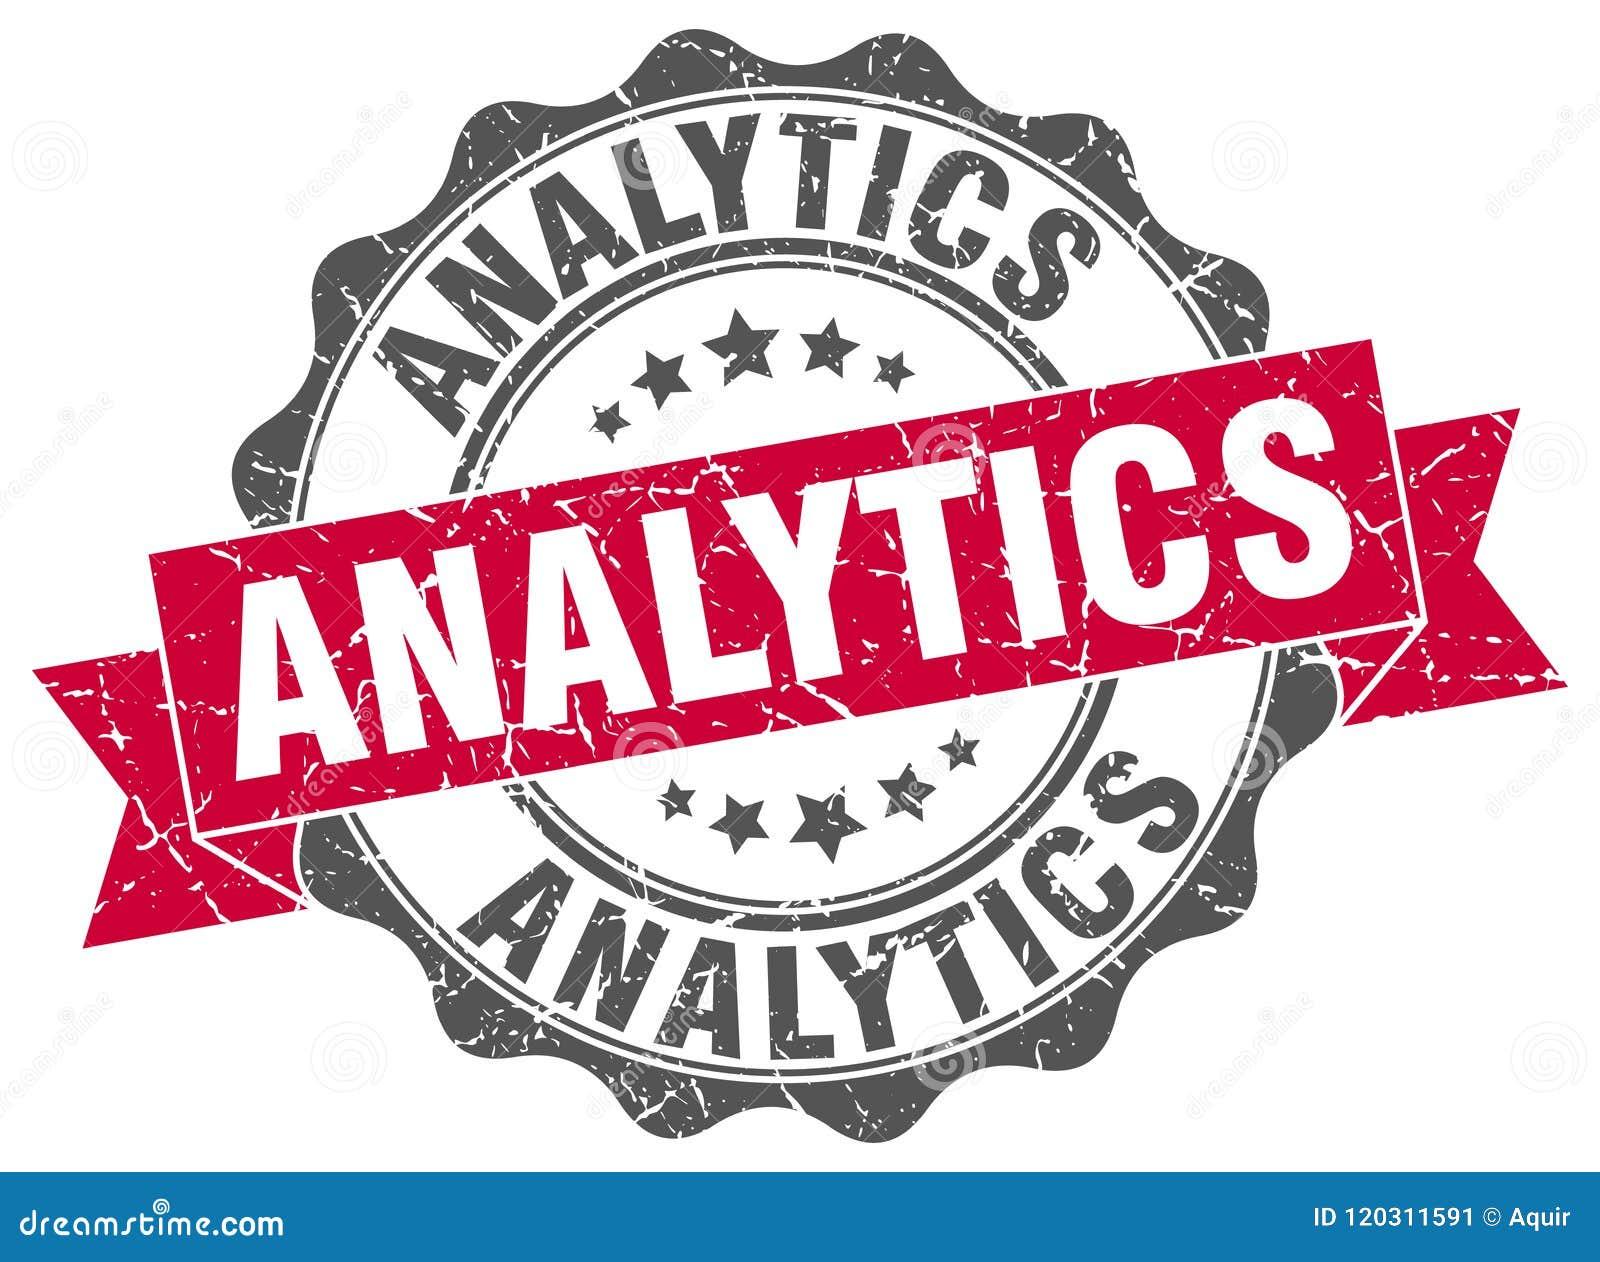 Analytikdichtung stempel